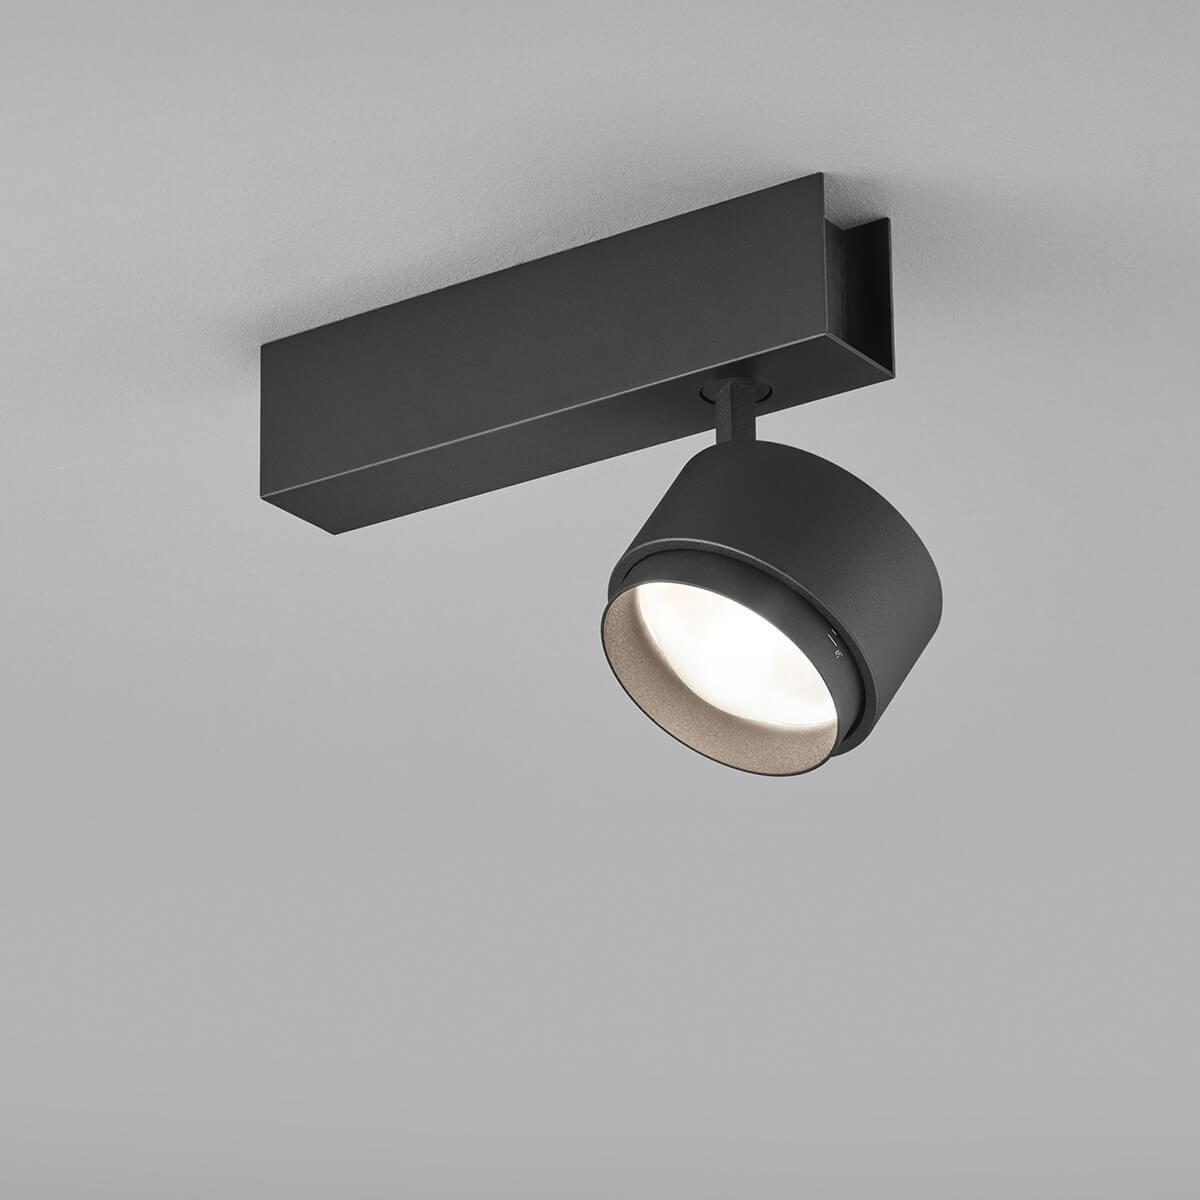 Helestra Pont LED Deckenaufbauleuchte 15/2080.22